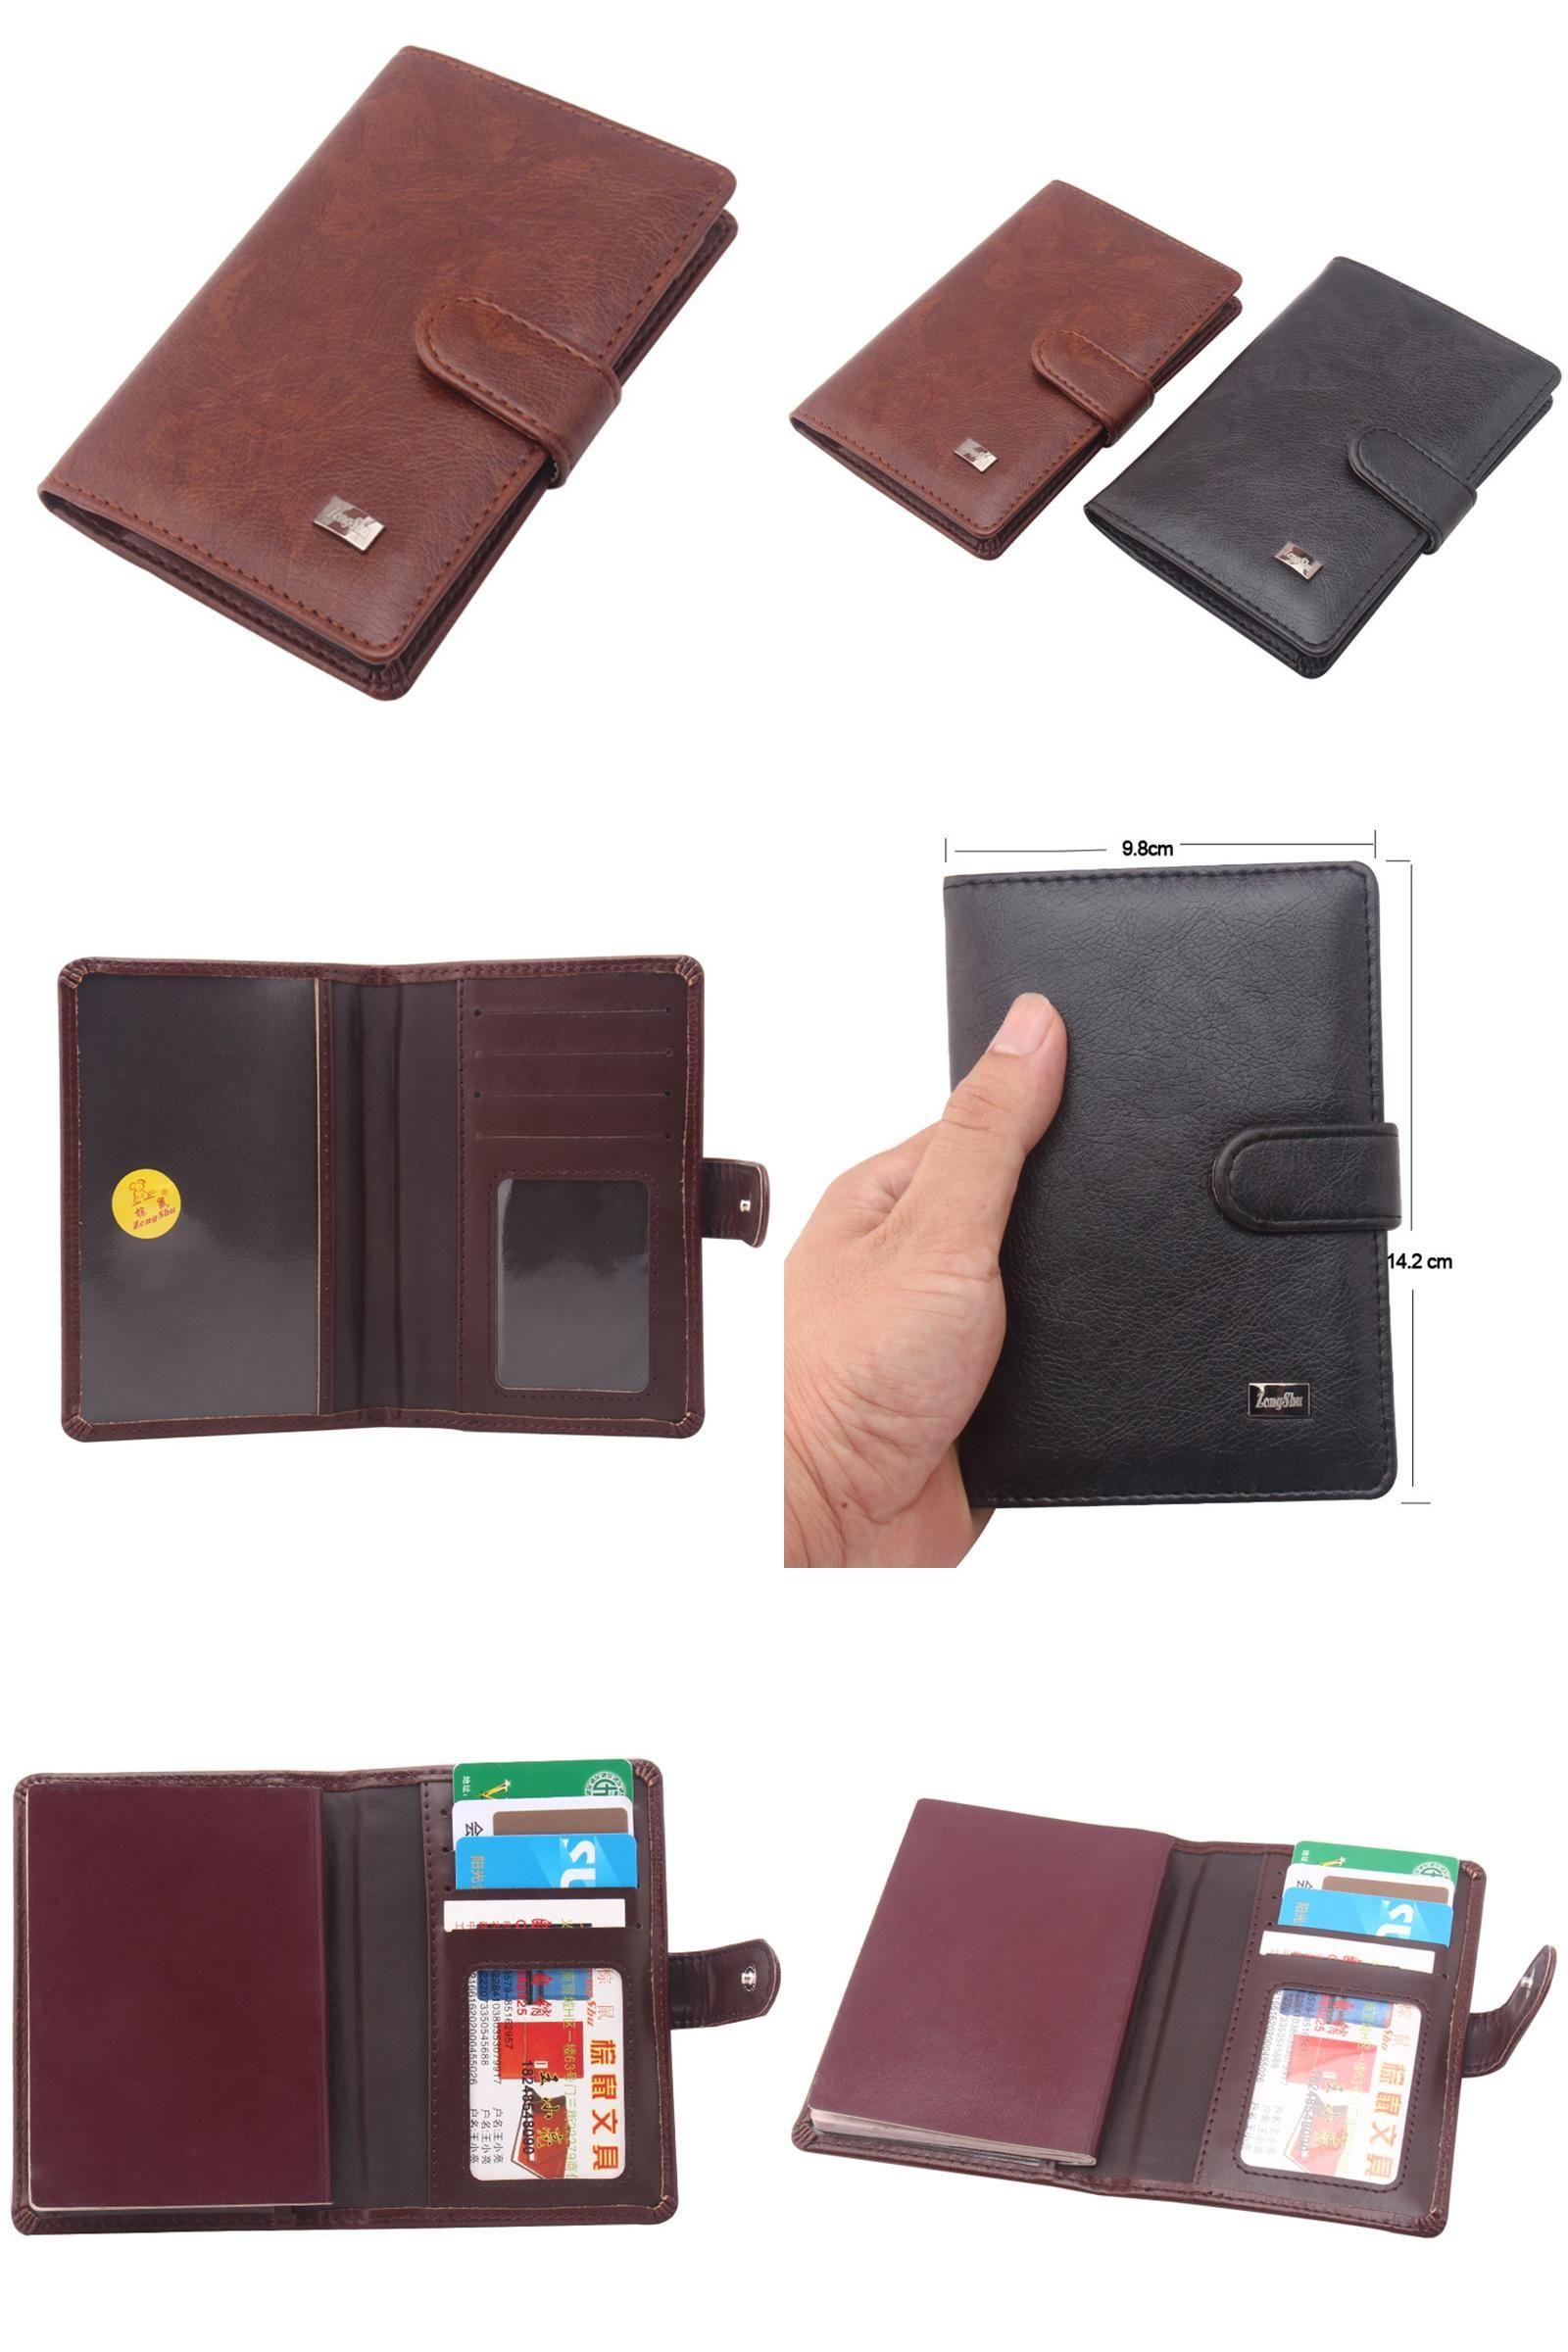 de958698af34 [Visit to Buy] PU Leather Passport Cover Men Travel Wallet Credit Card  Holder Cover Russian Driver License Wallet Document Case --BIH009 PM15  #Advertisement